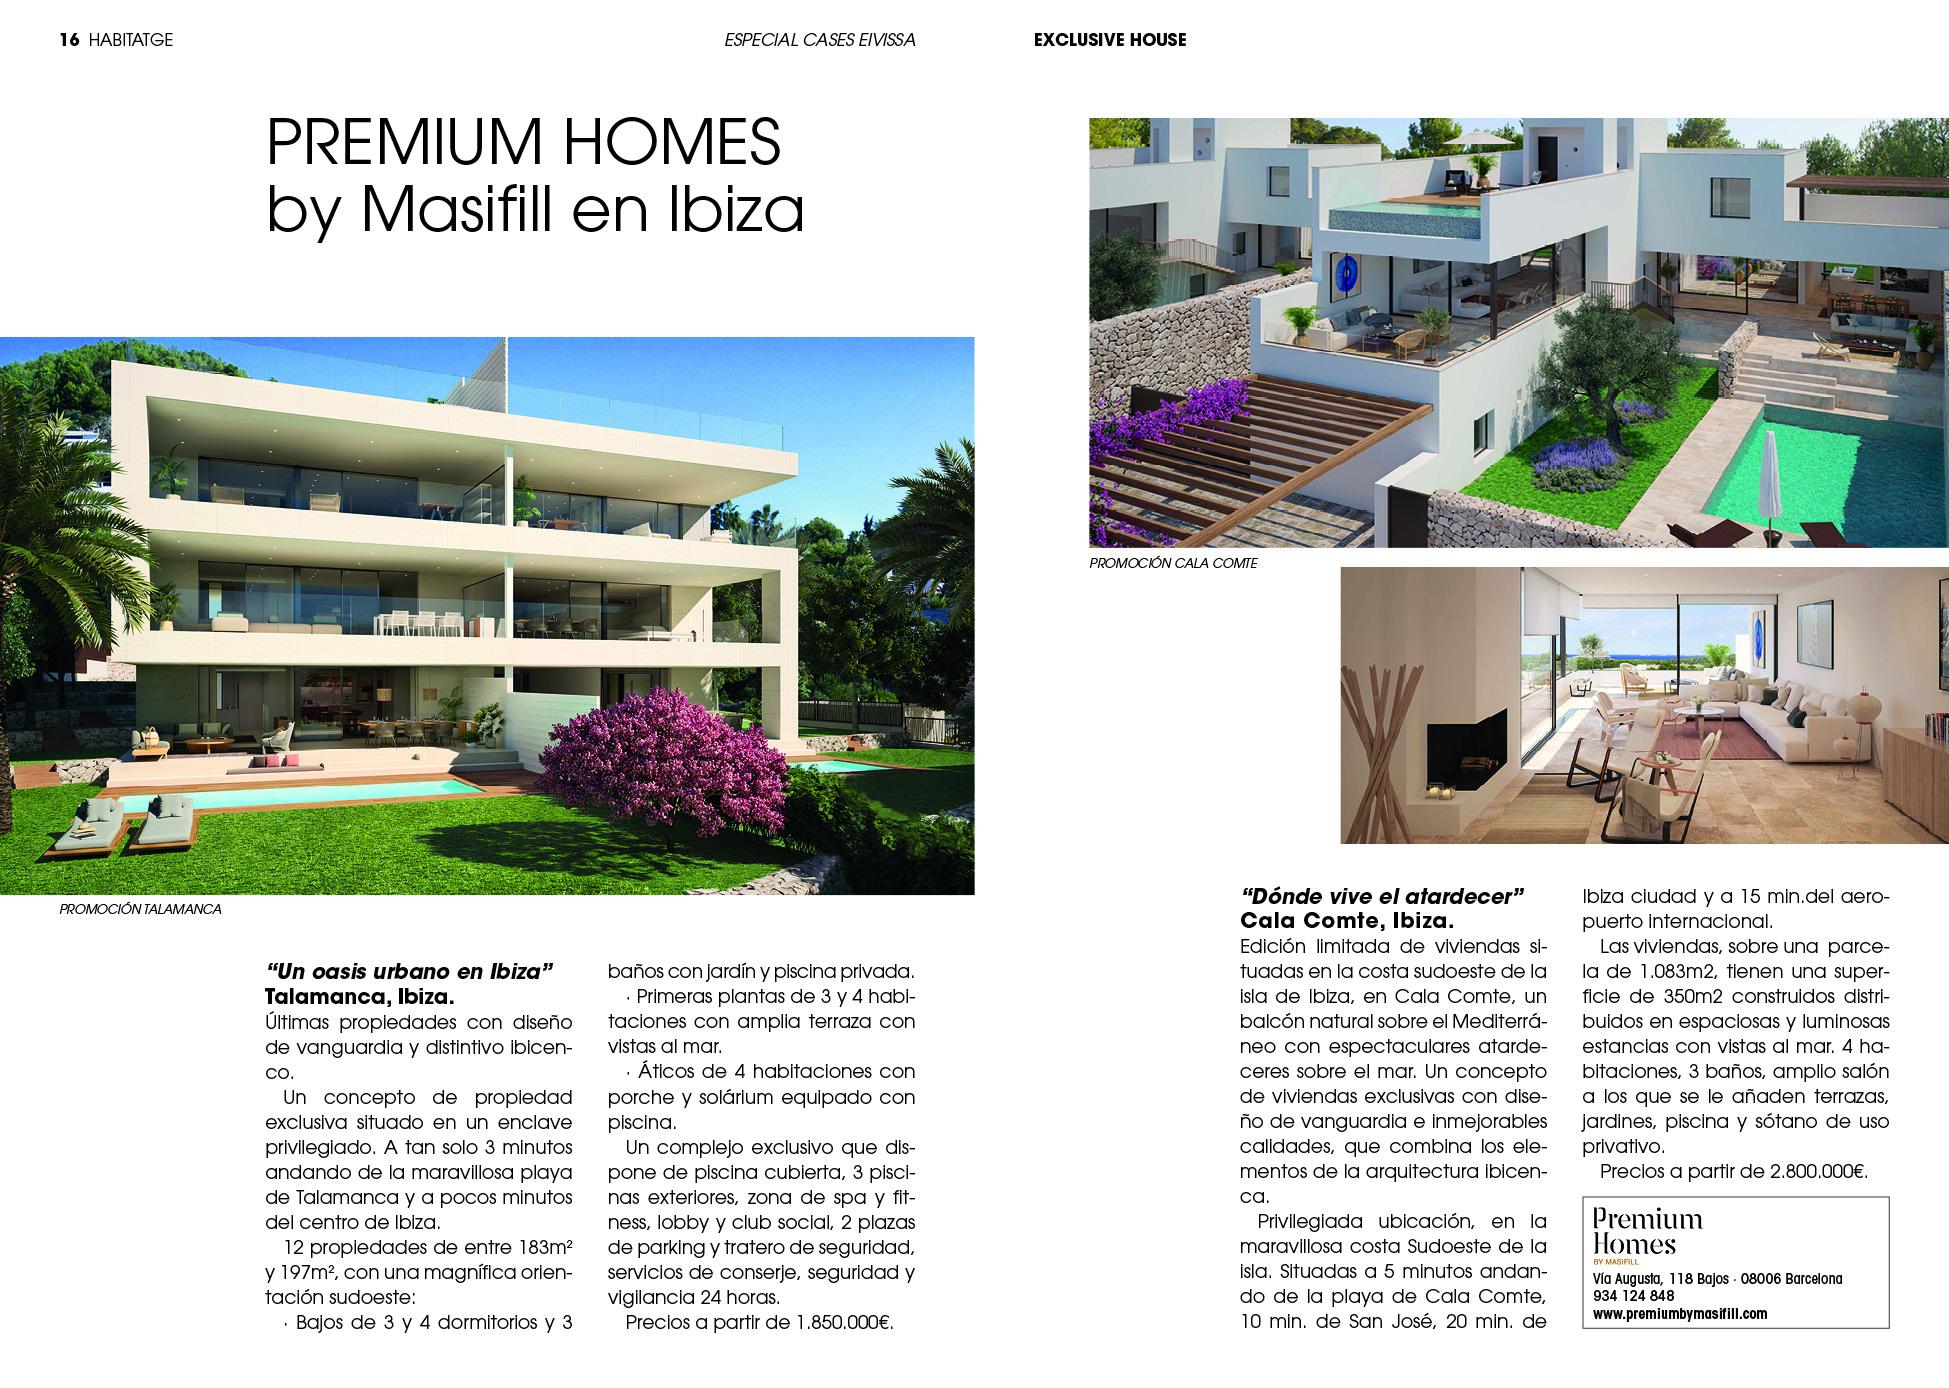 P16 17 Eivissa Masifill Exclusive House Hs Abril 2018